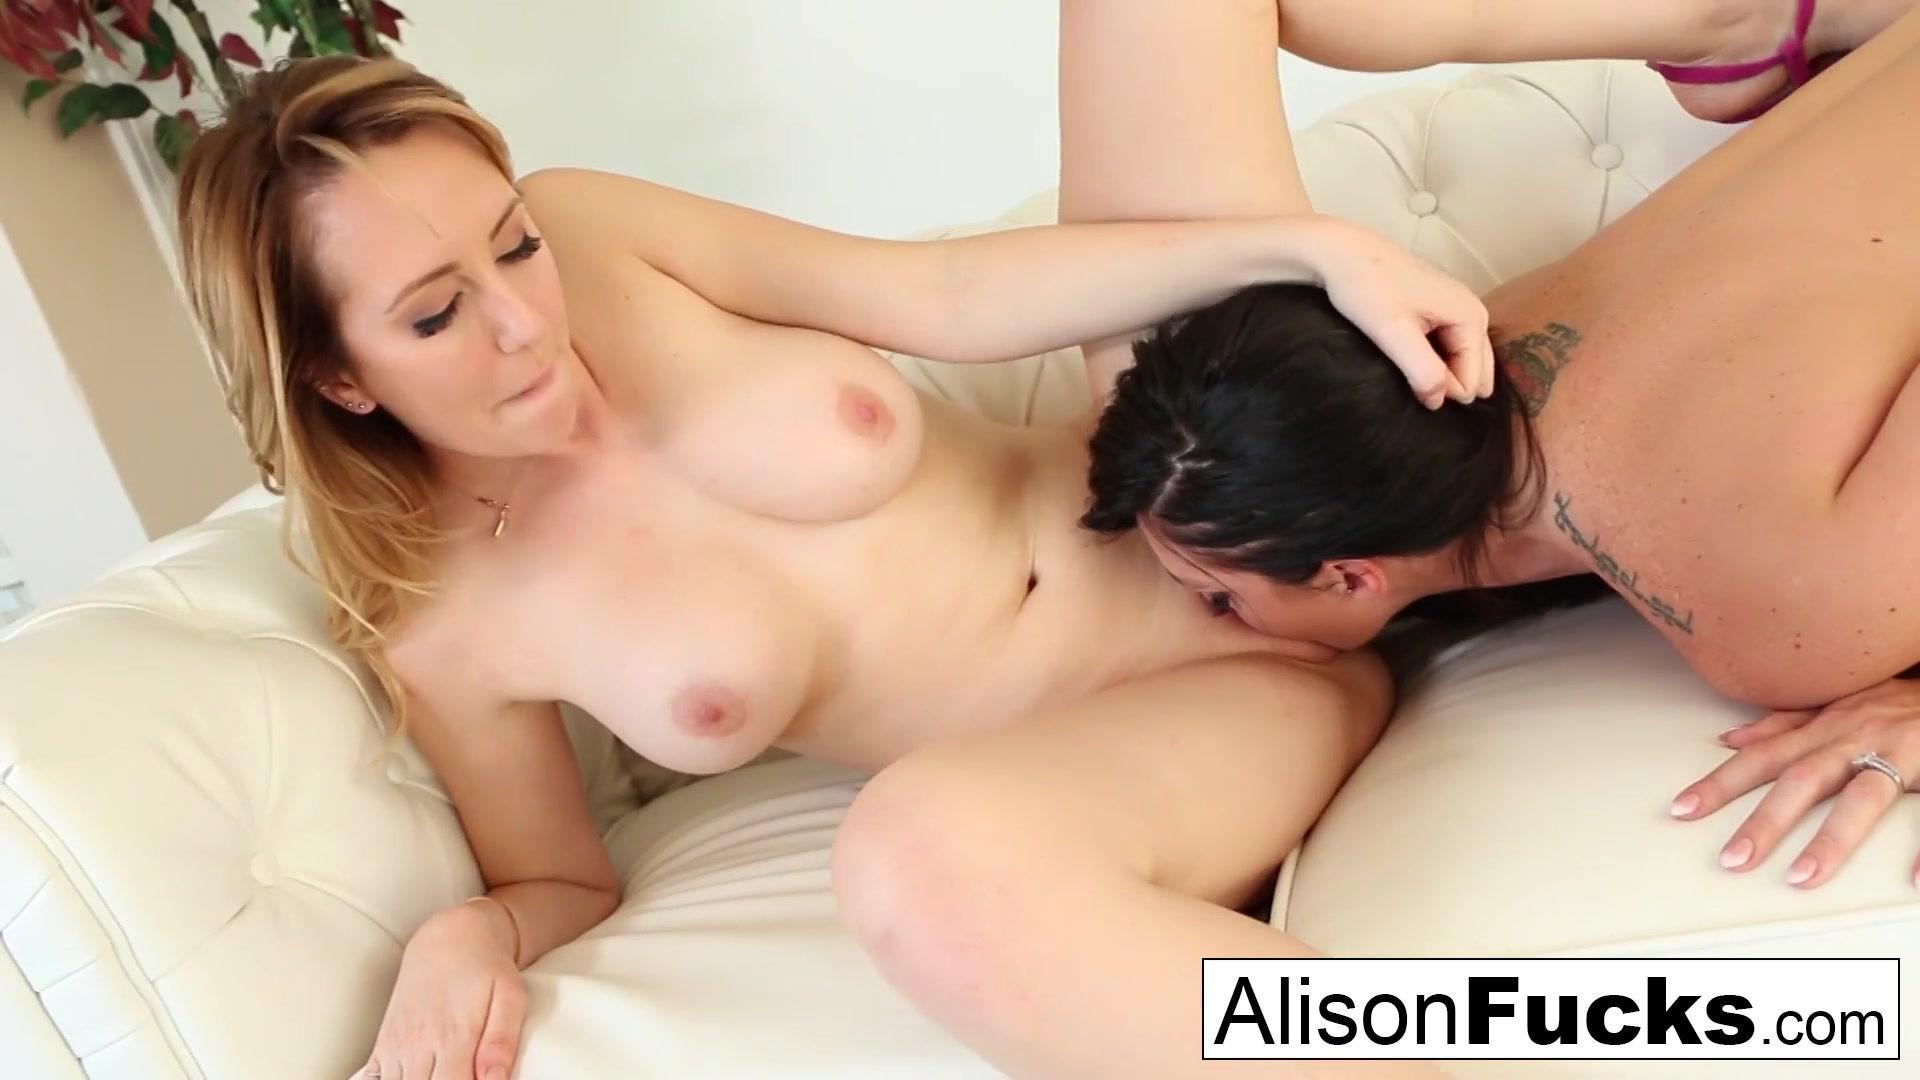 Lesbian sexis masturbation 69